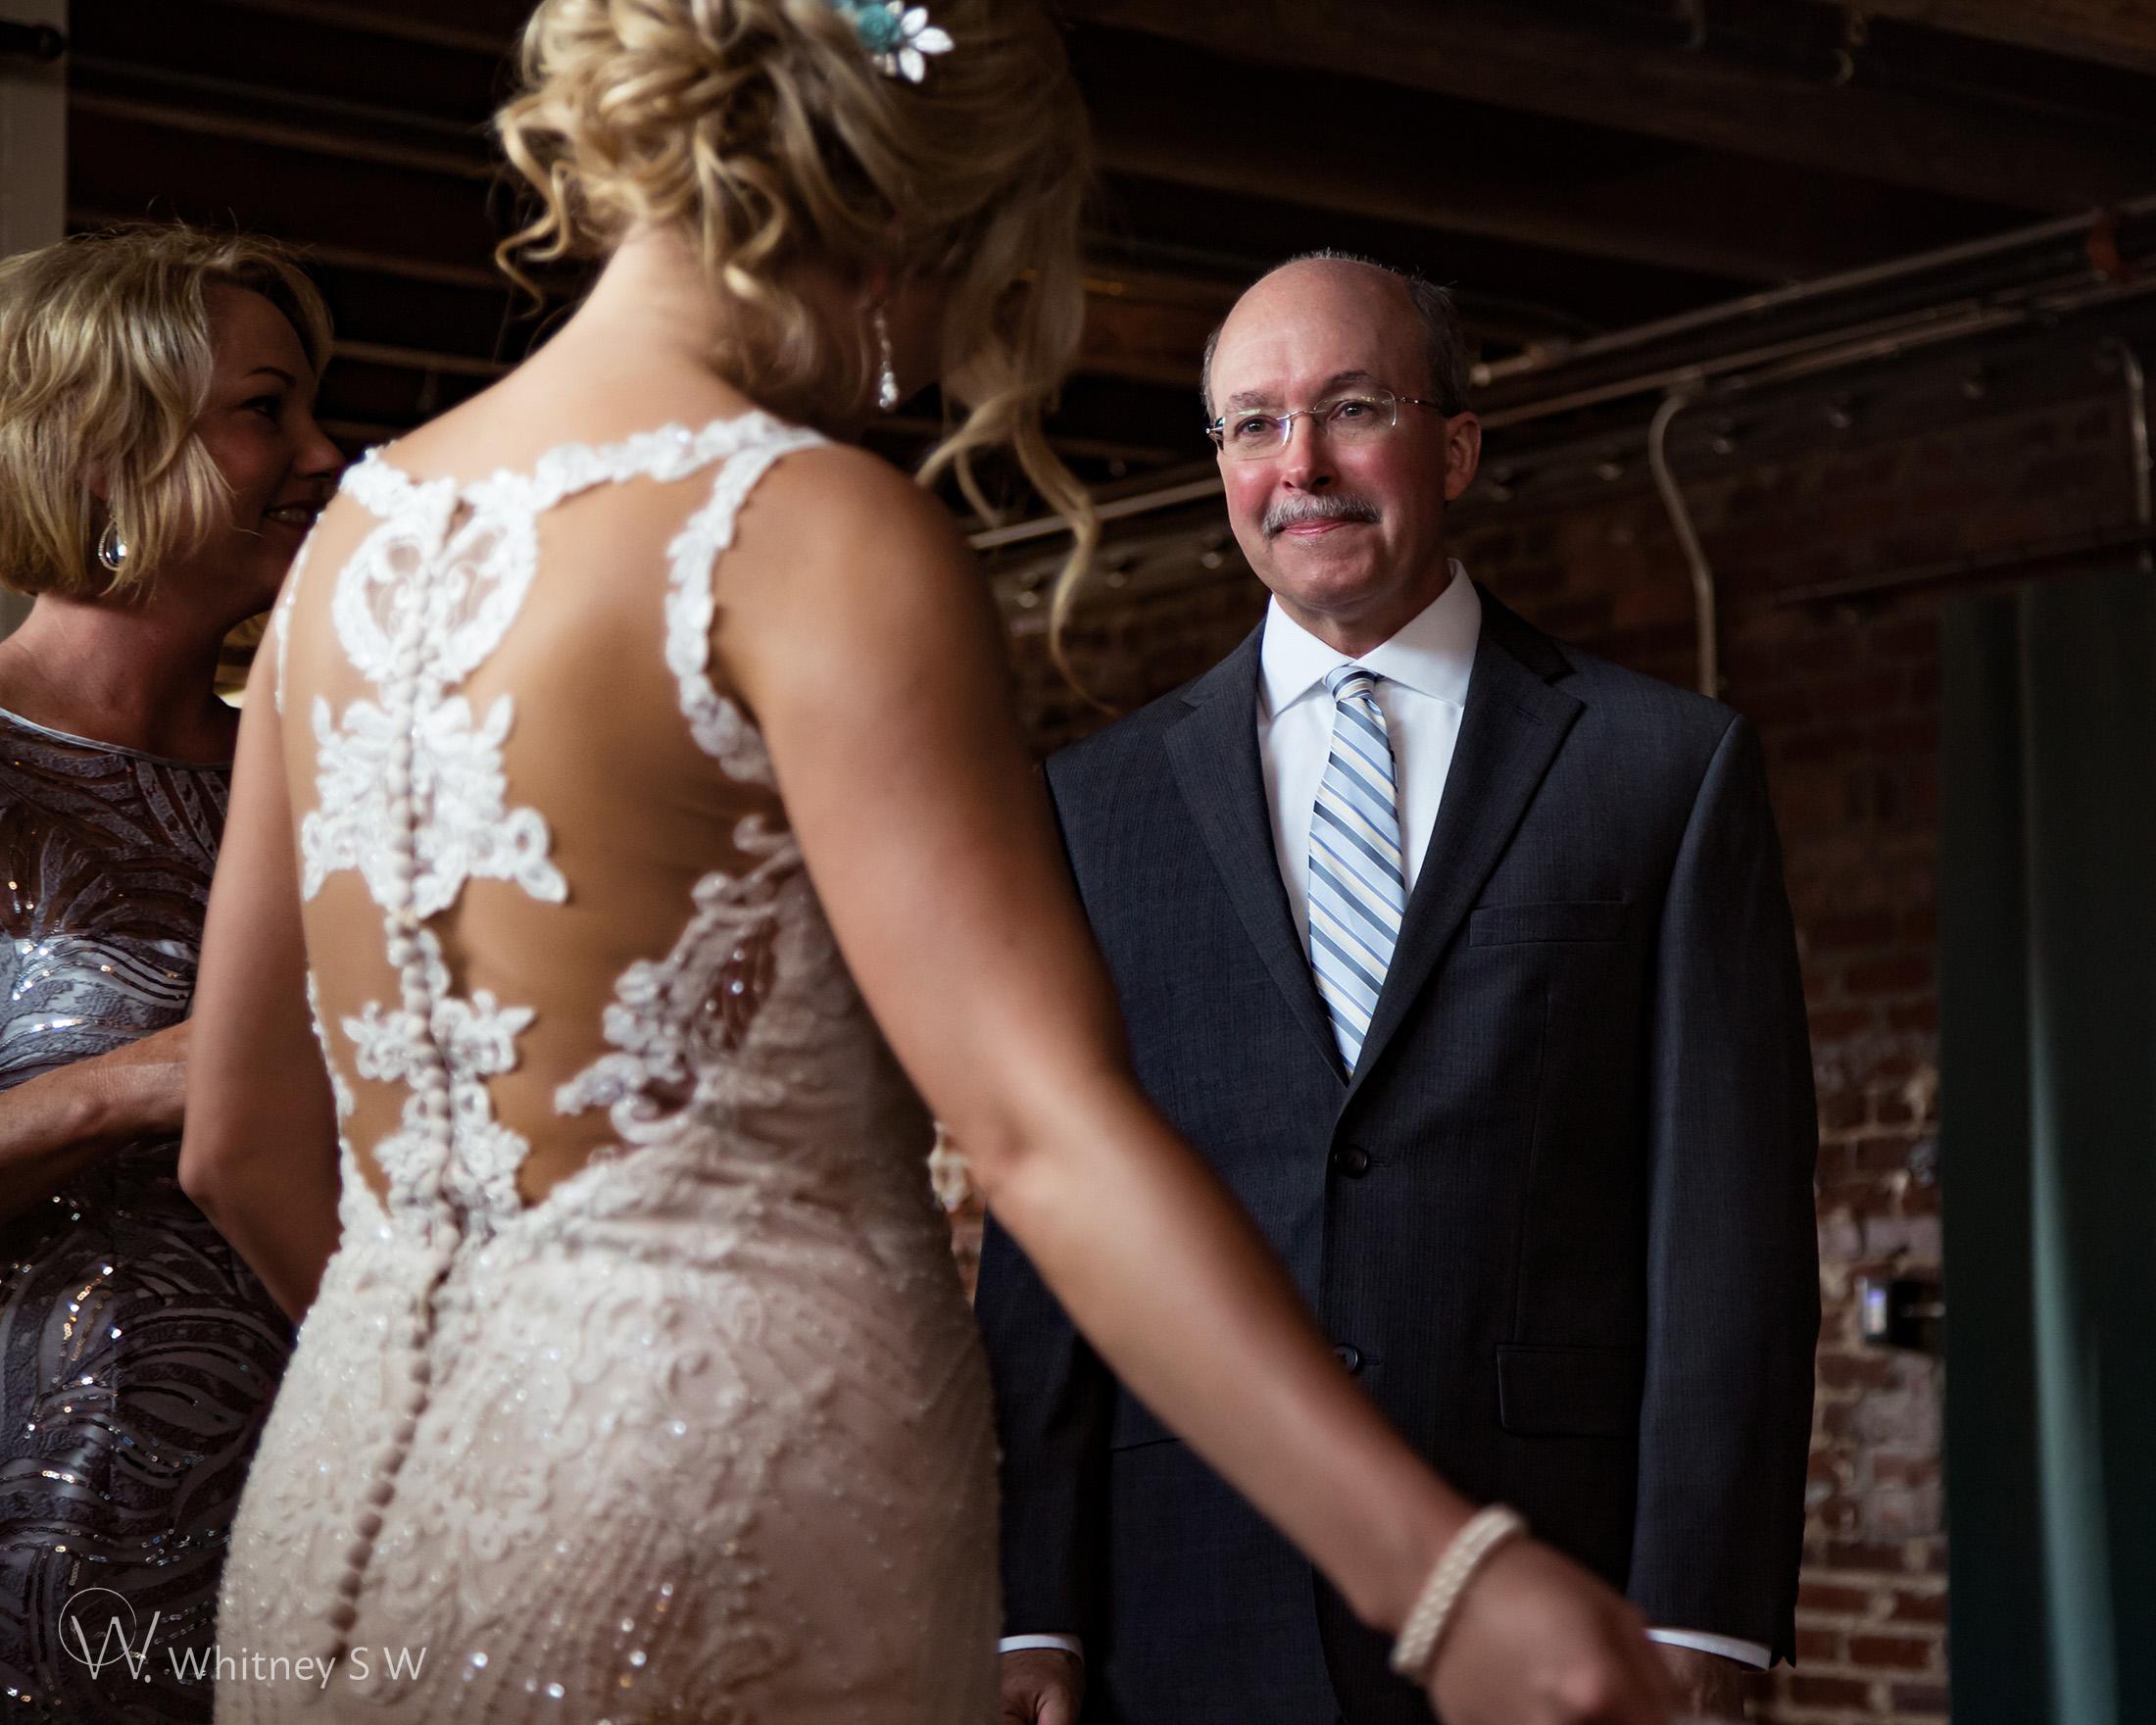 Morgan & Kaivon Wedding - Photography by Whitney S Williams whitneysw (42).jpg